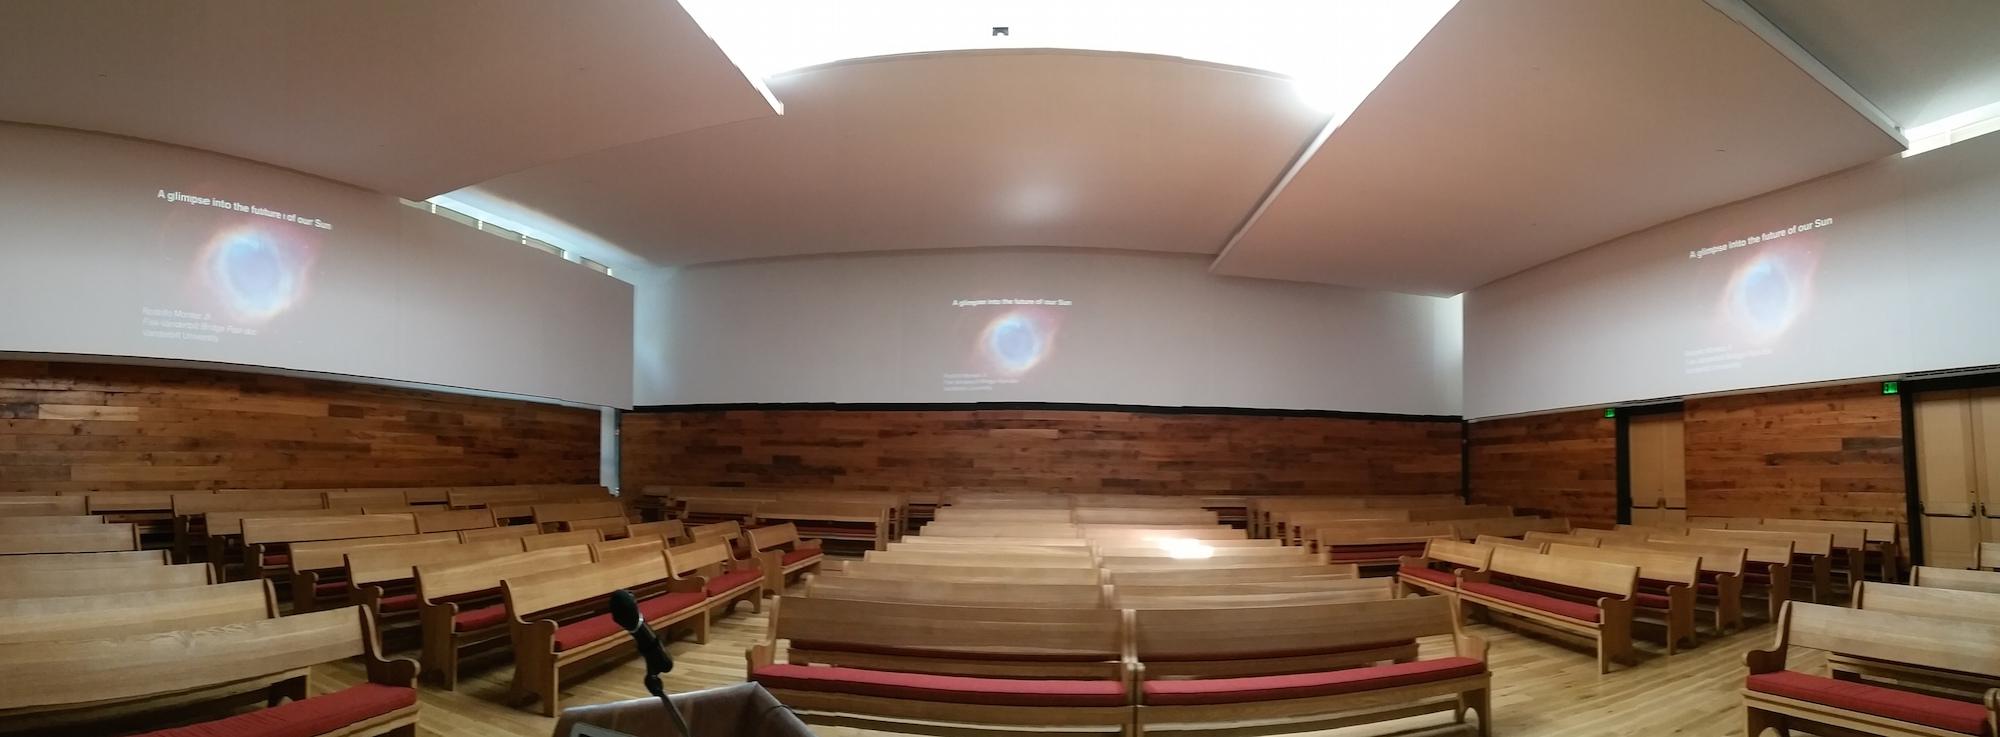 Sidwell Auditorium